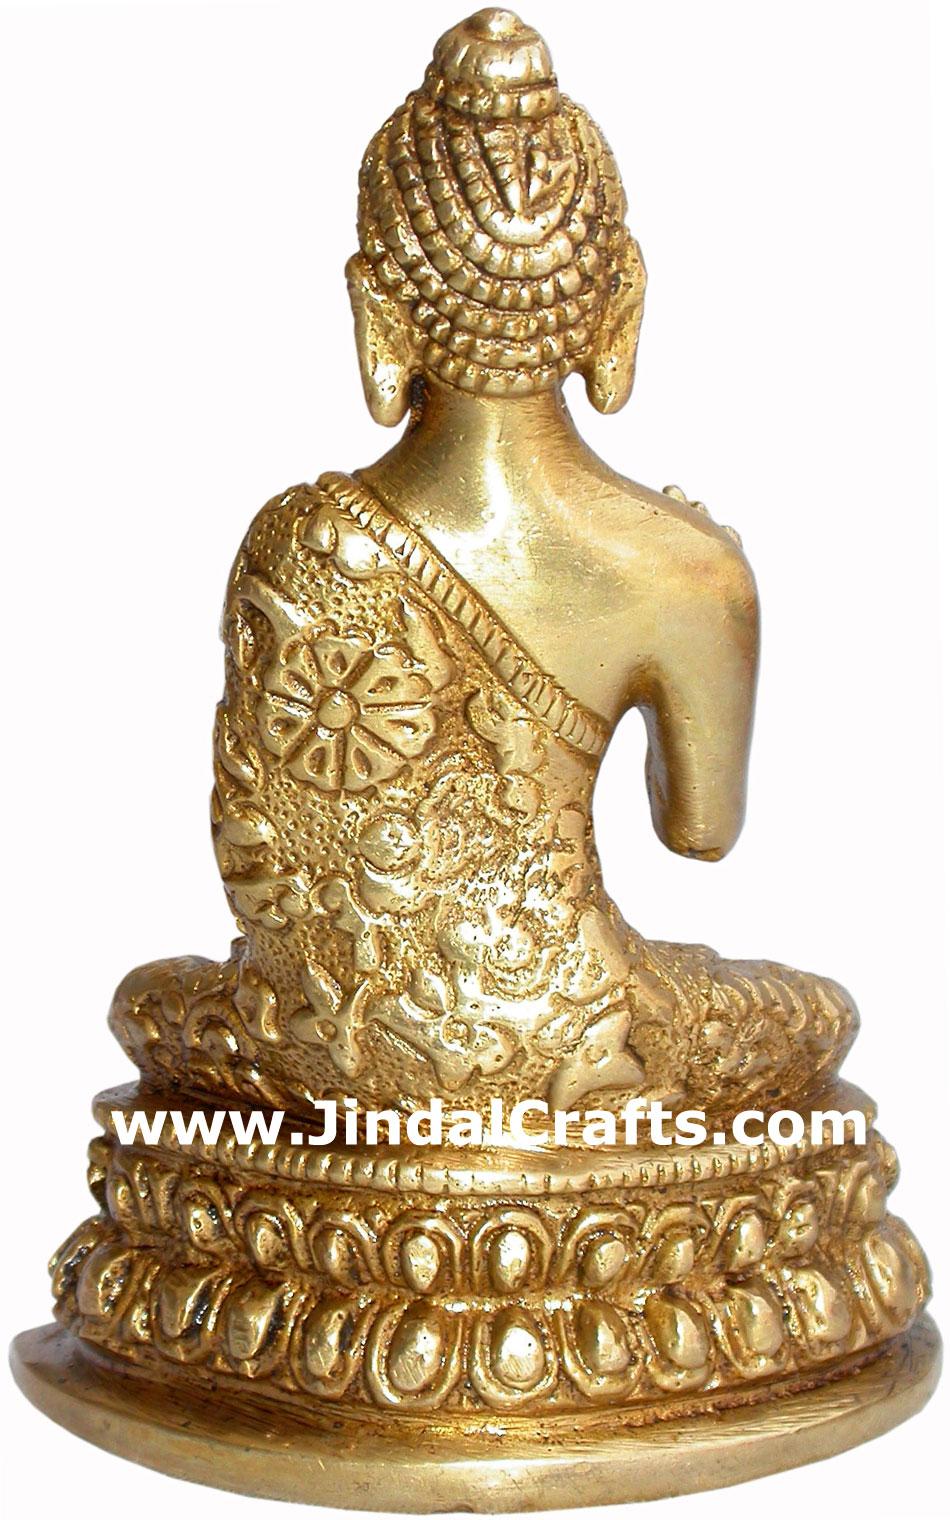 Buddha Hand Carved Indian Art Craft Handicraft Home Decor Brass Figurine